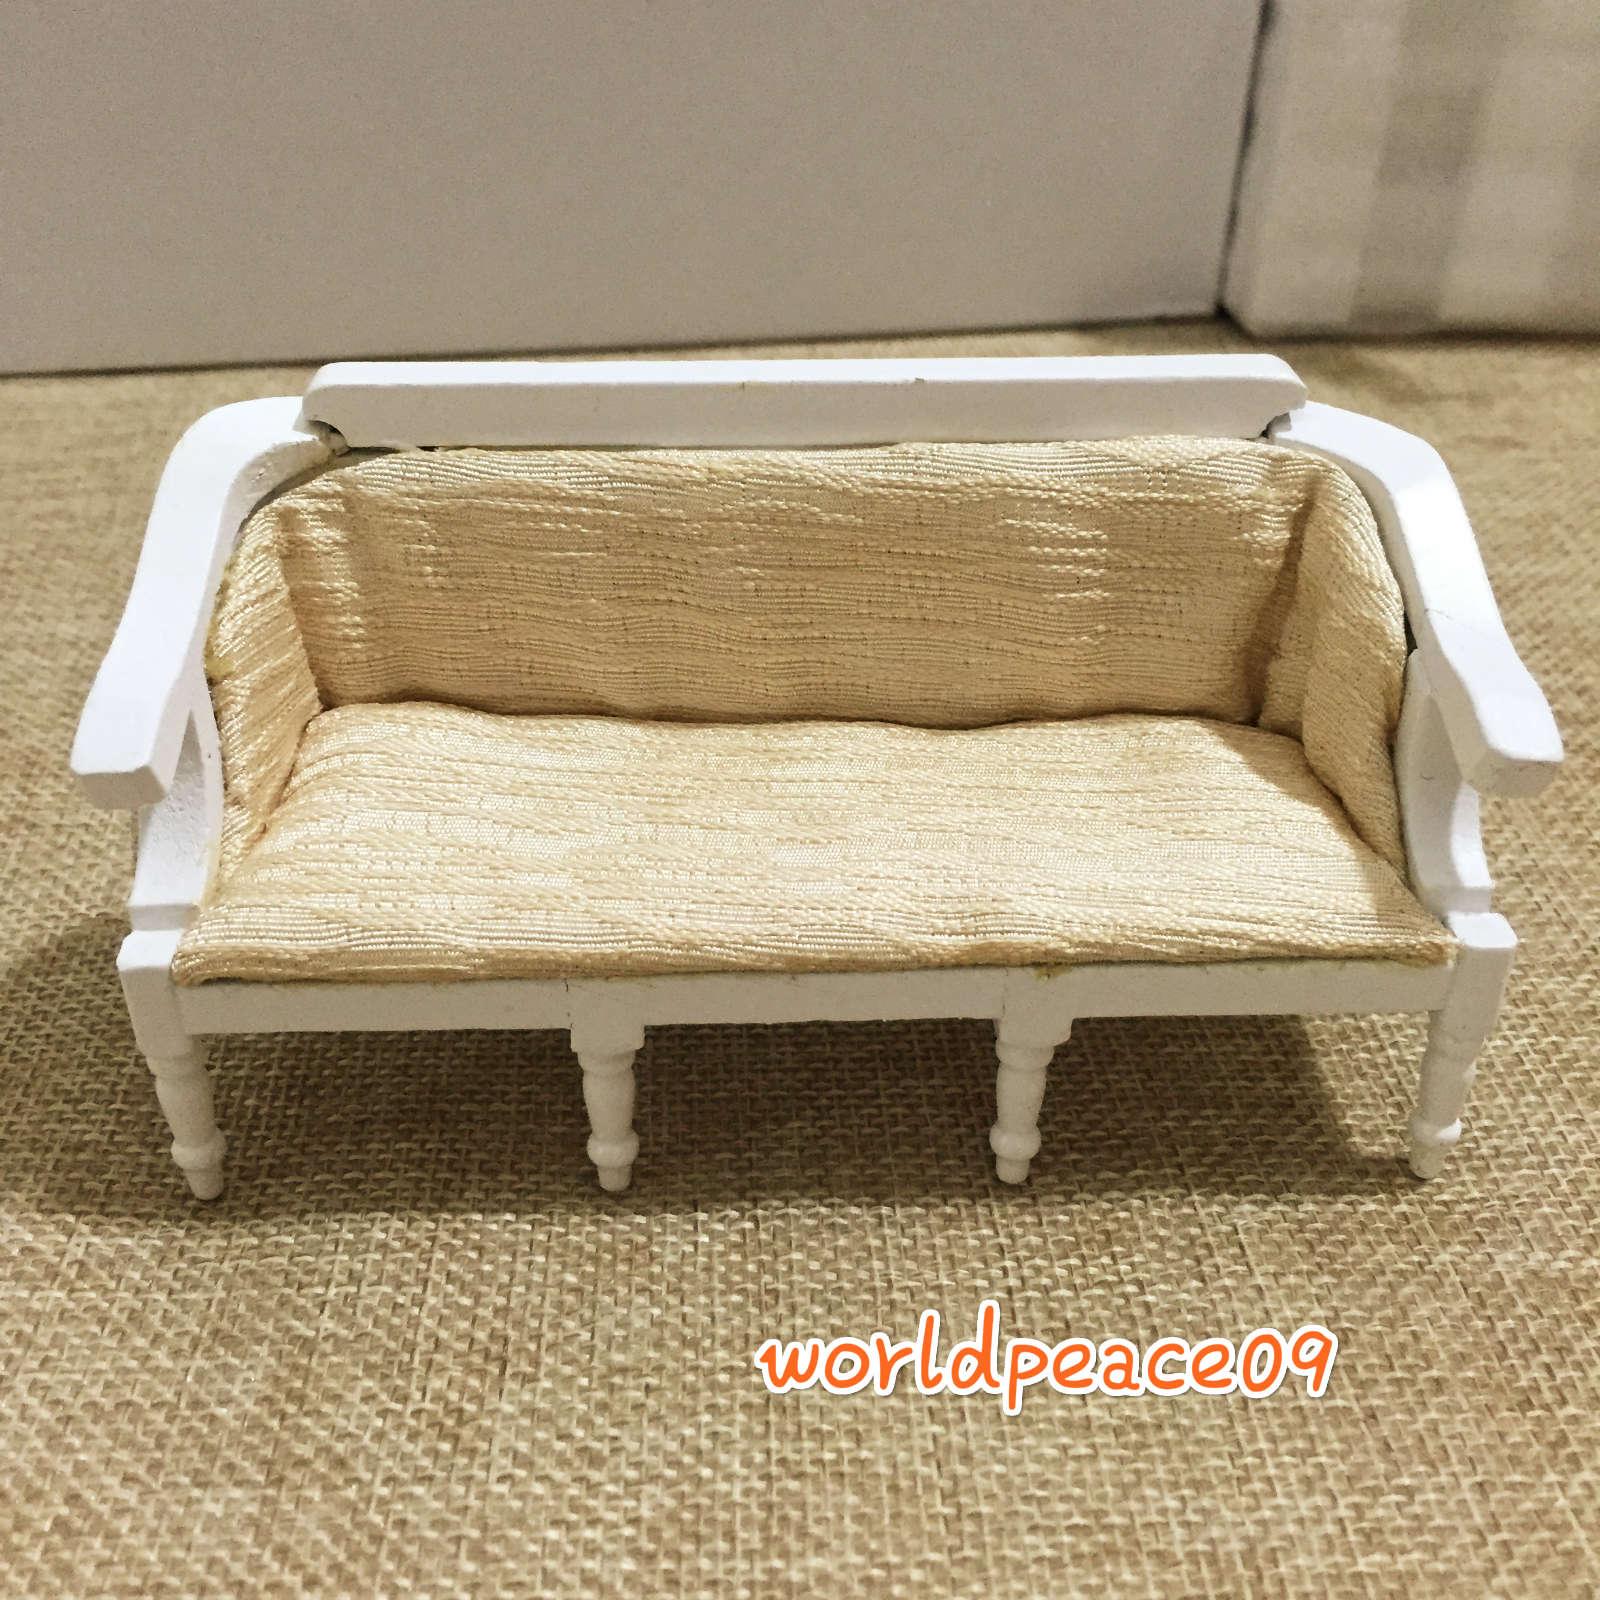 Miniature Plain Couch Sofa Dollhouse Furniture Model Decor White